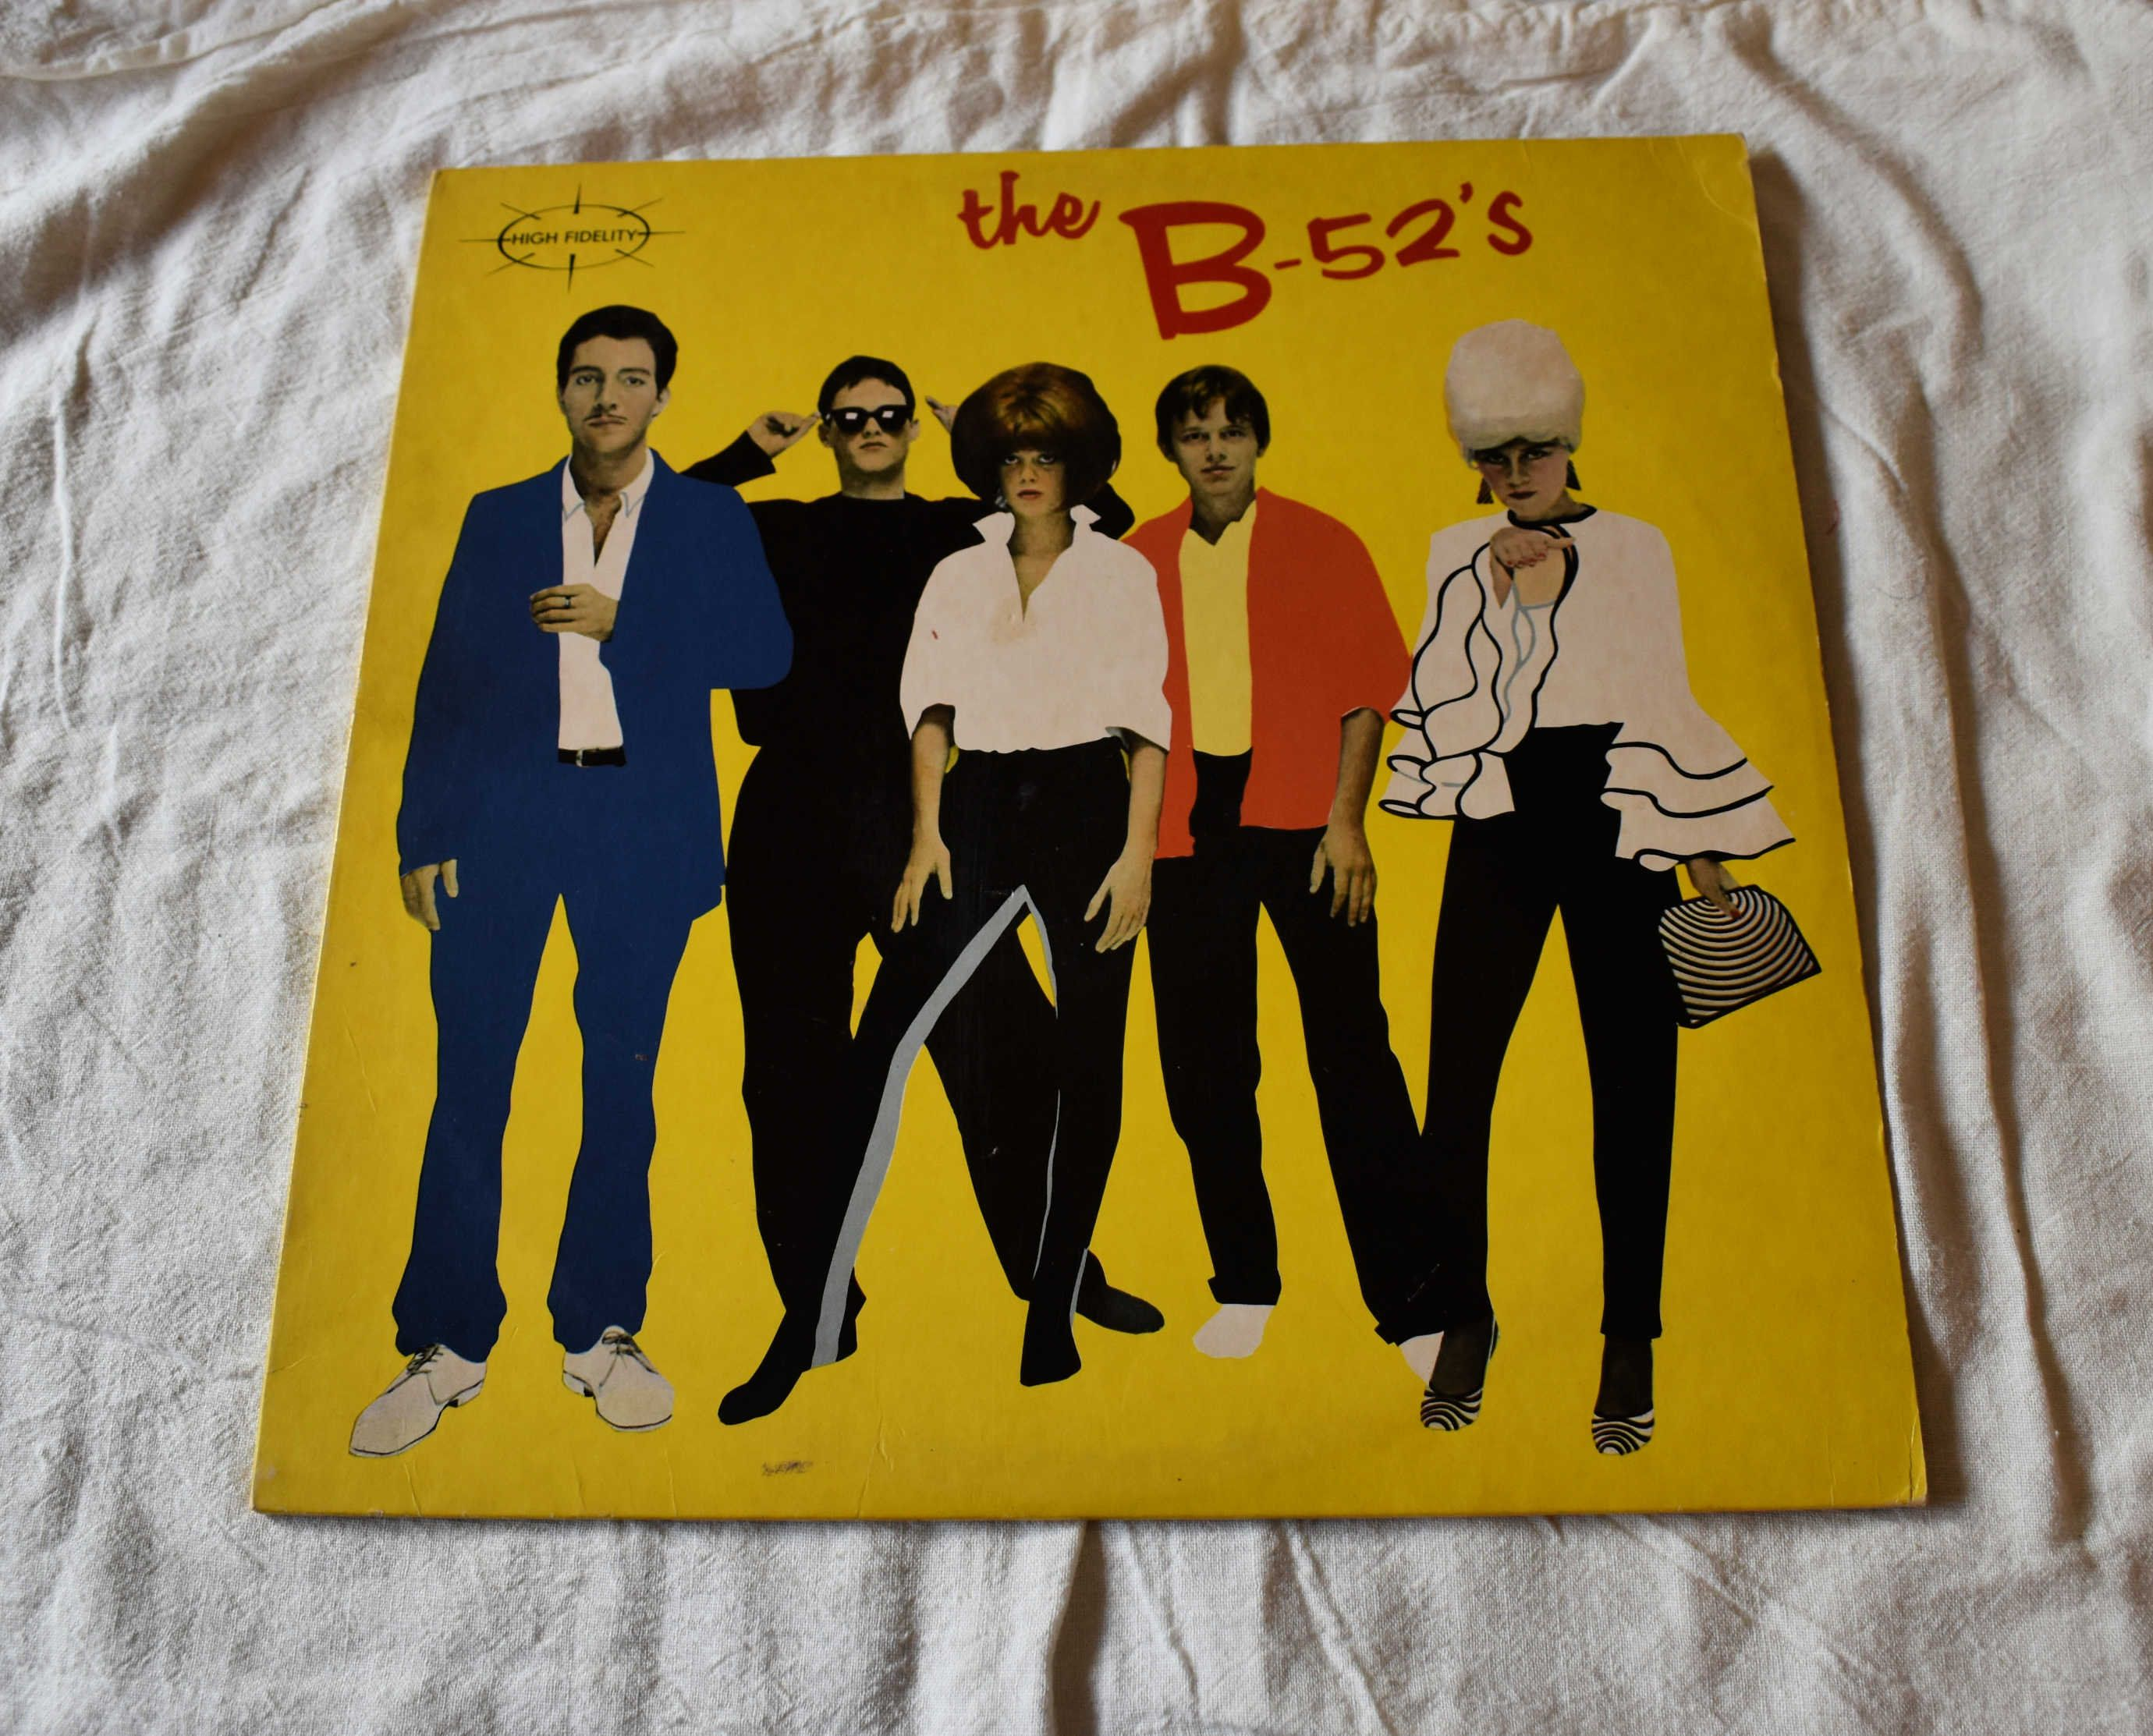 Vintage Vinyl 1970s New Wave The B 52 S Self Titled Etsy Vinyl The B 52 S Album Covers